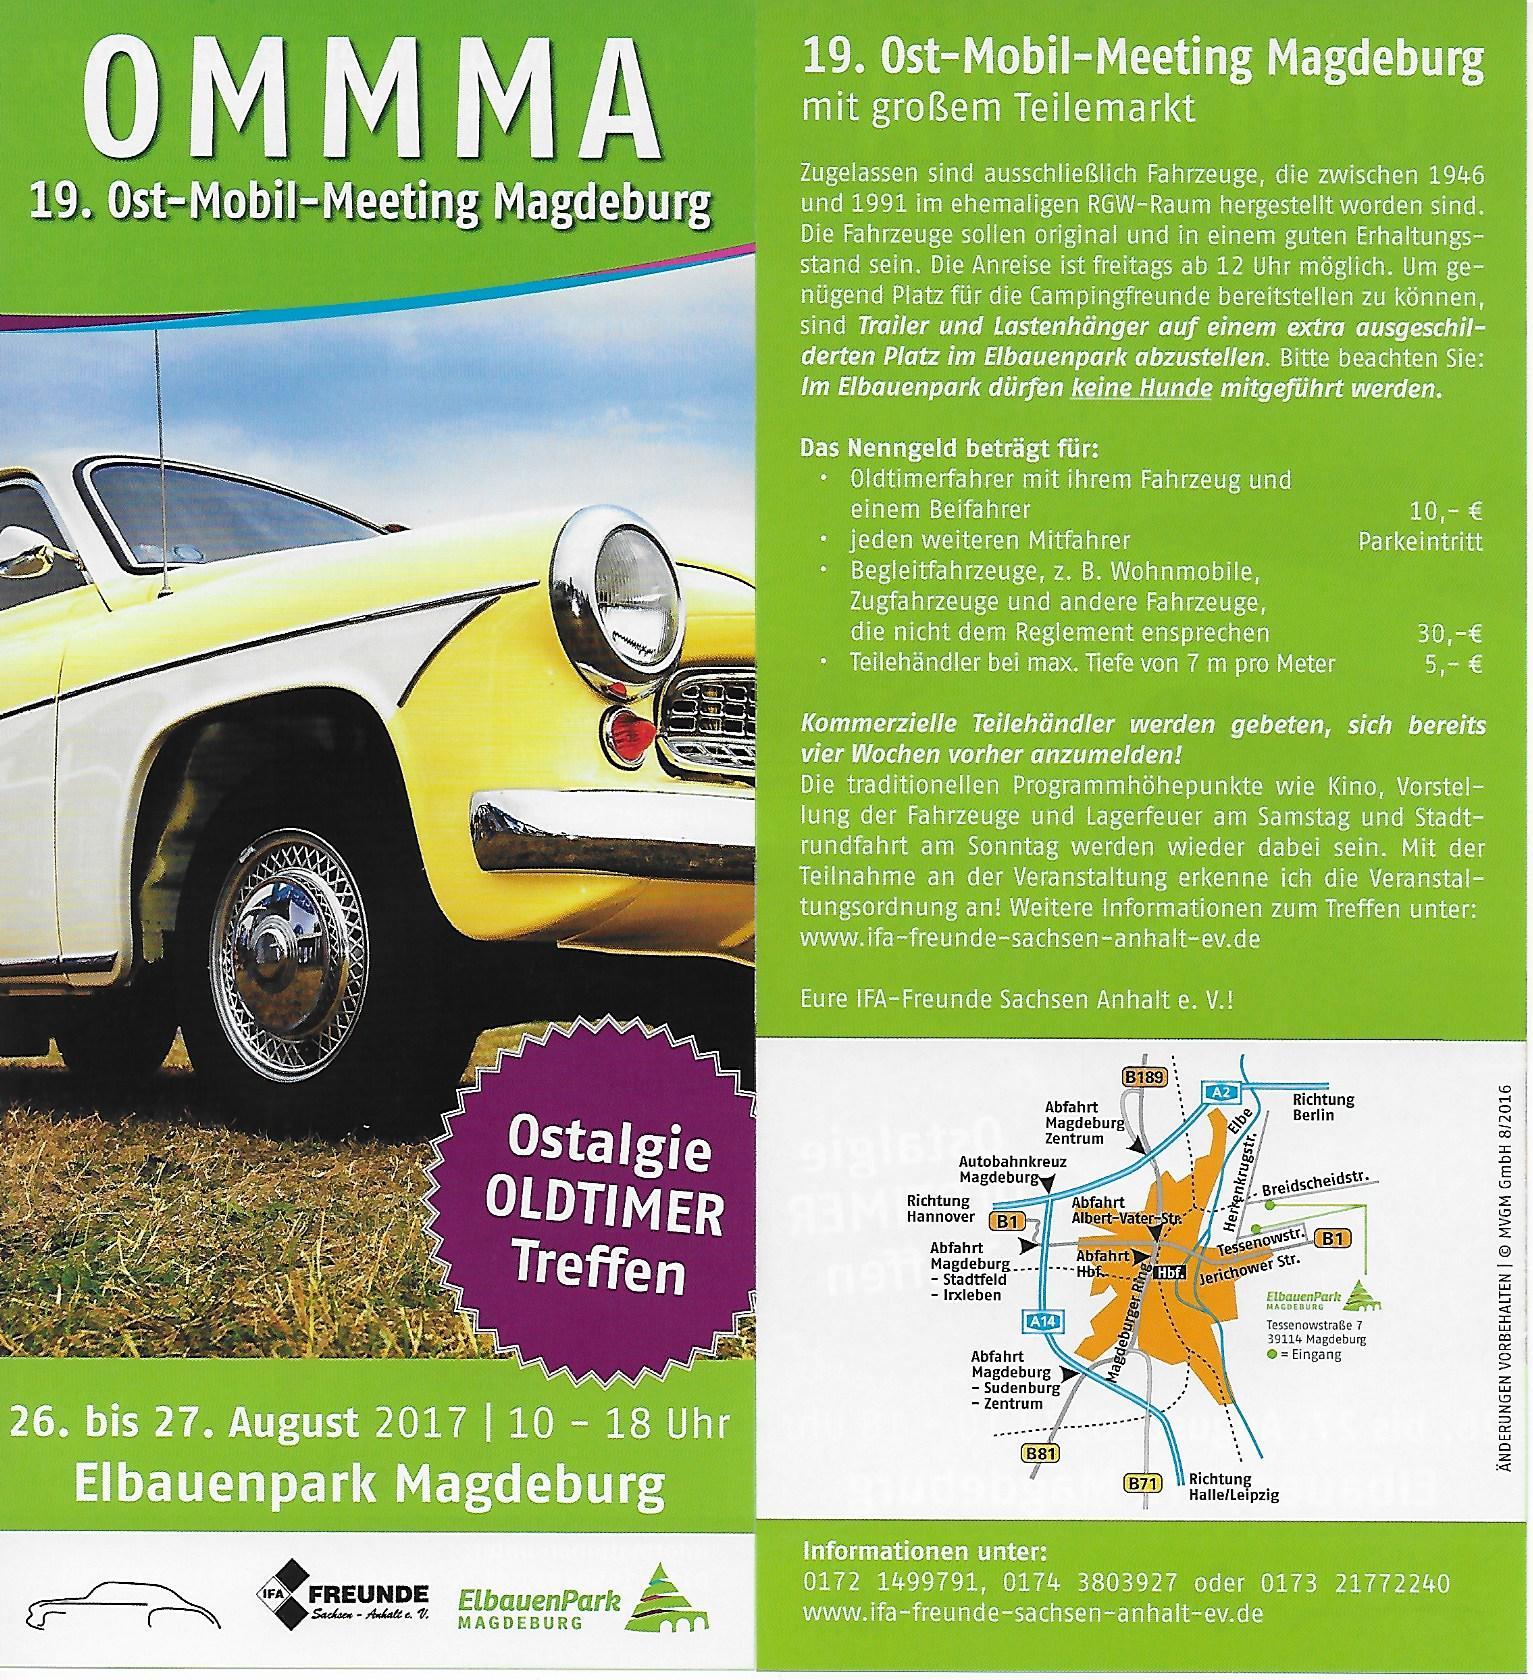 19_OMMMA_Flyer.jpg